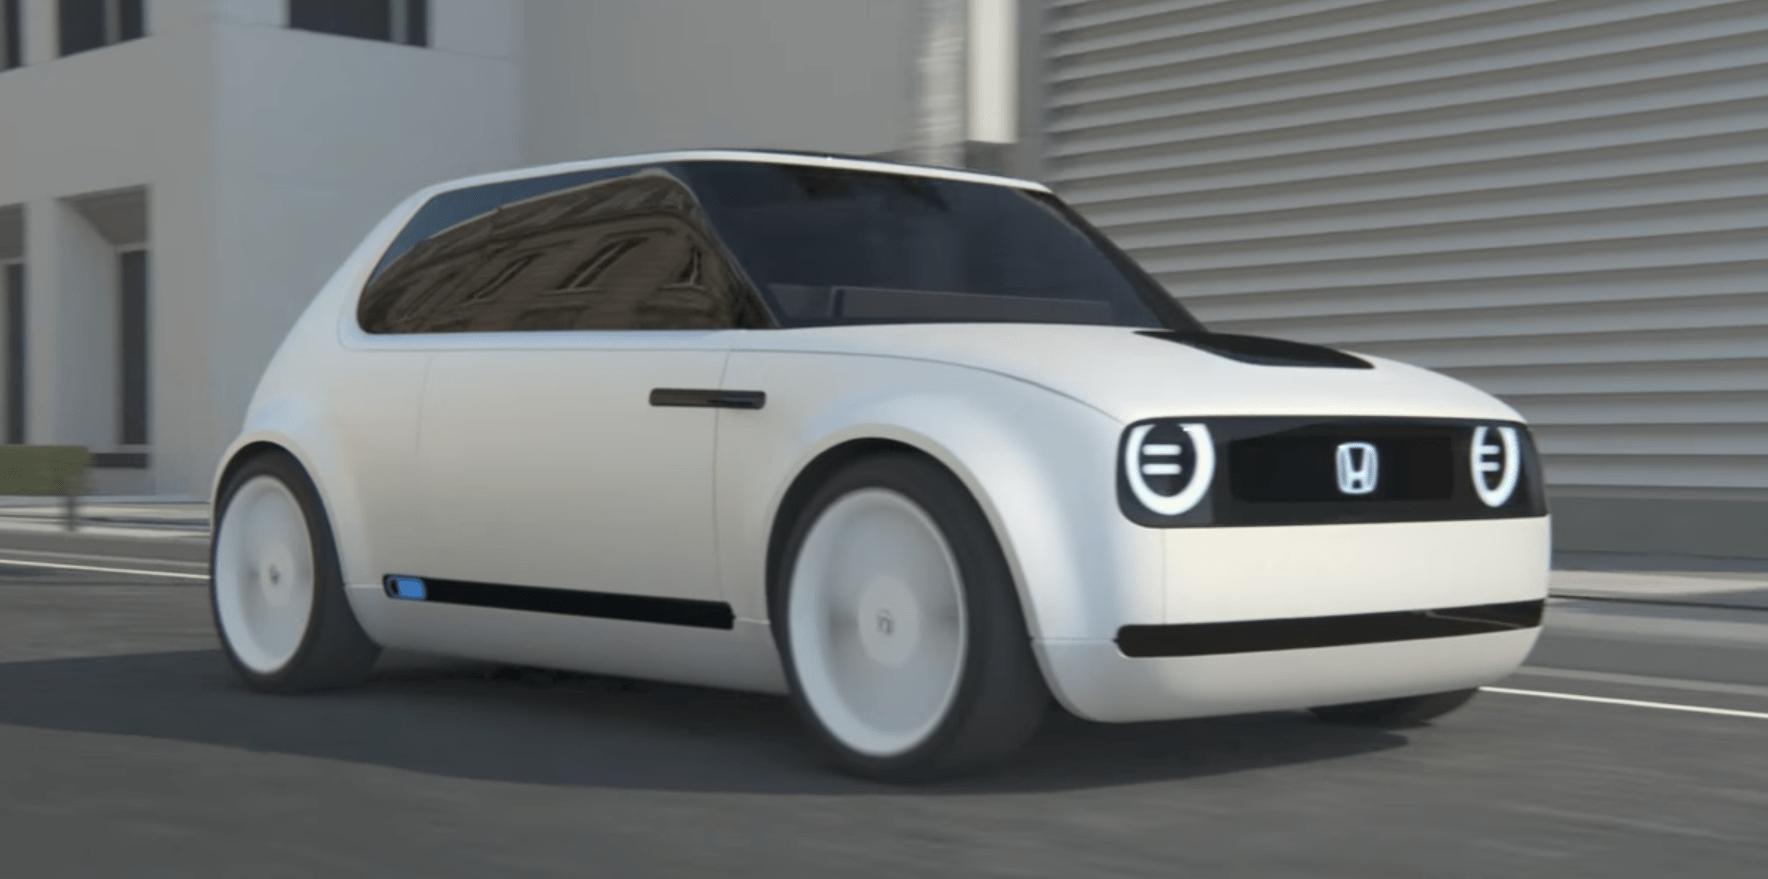 Honda Delays Its Fun Retro Looking All Electric Vehicle To 2020 Report Says Electrek Electric Car Concept New Model Car Honda Electric Car